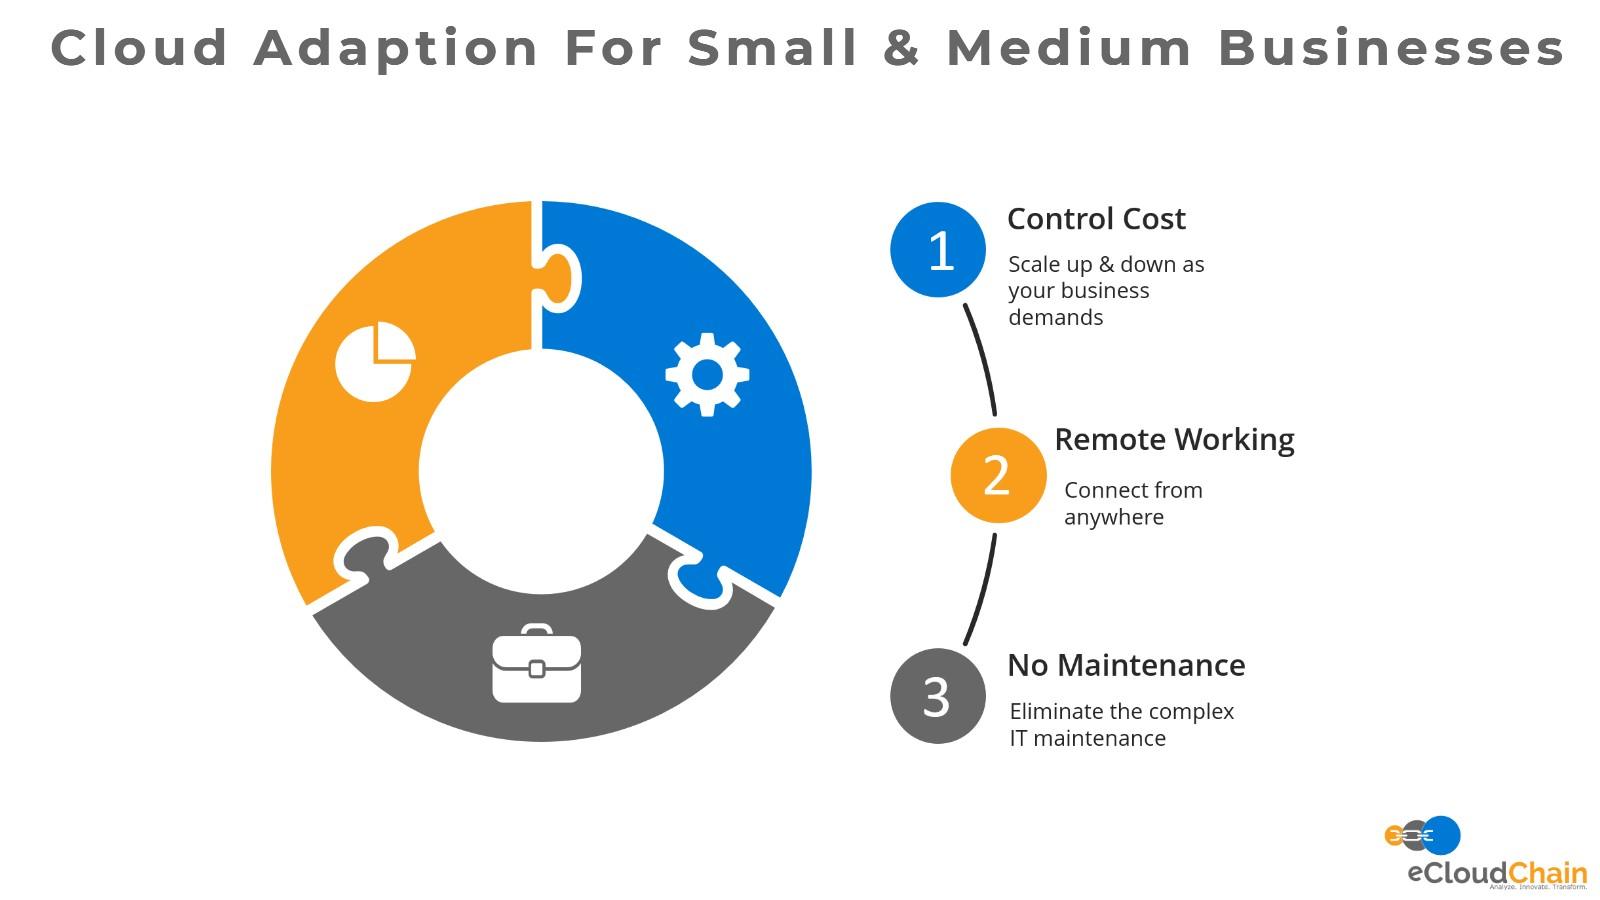 Cloud Adaption For Small & Medium Business